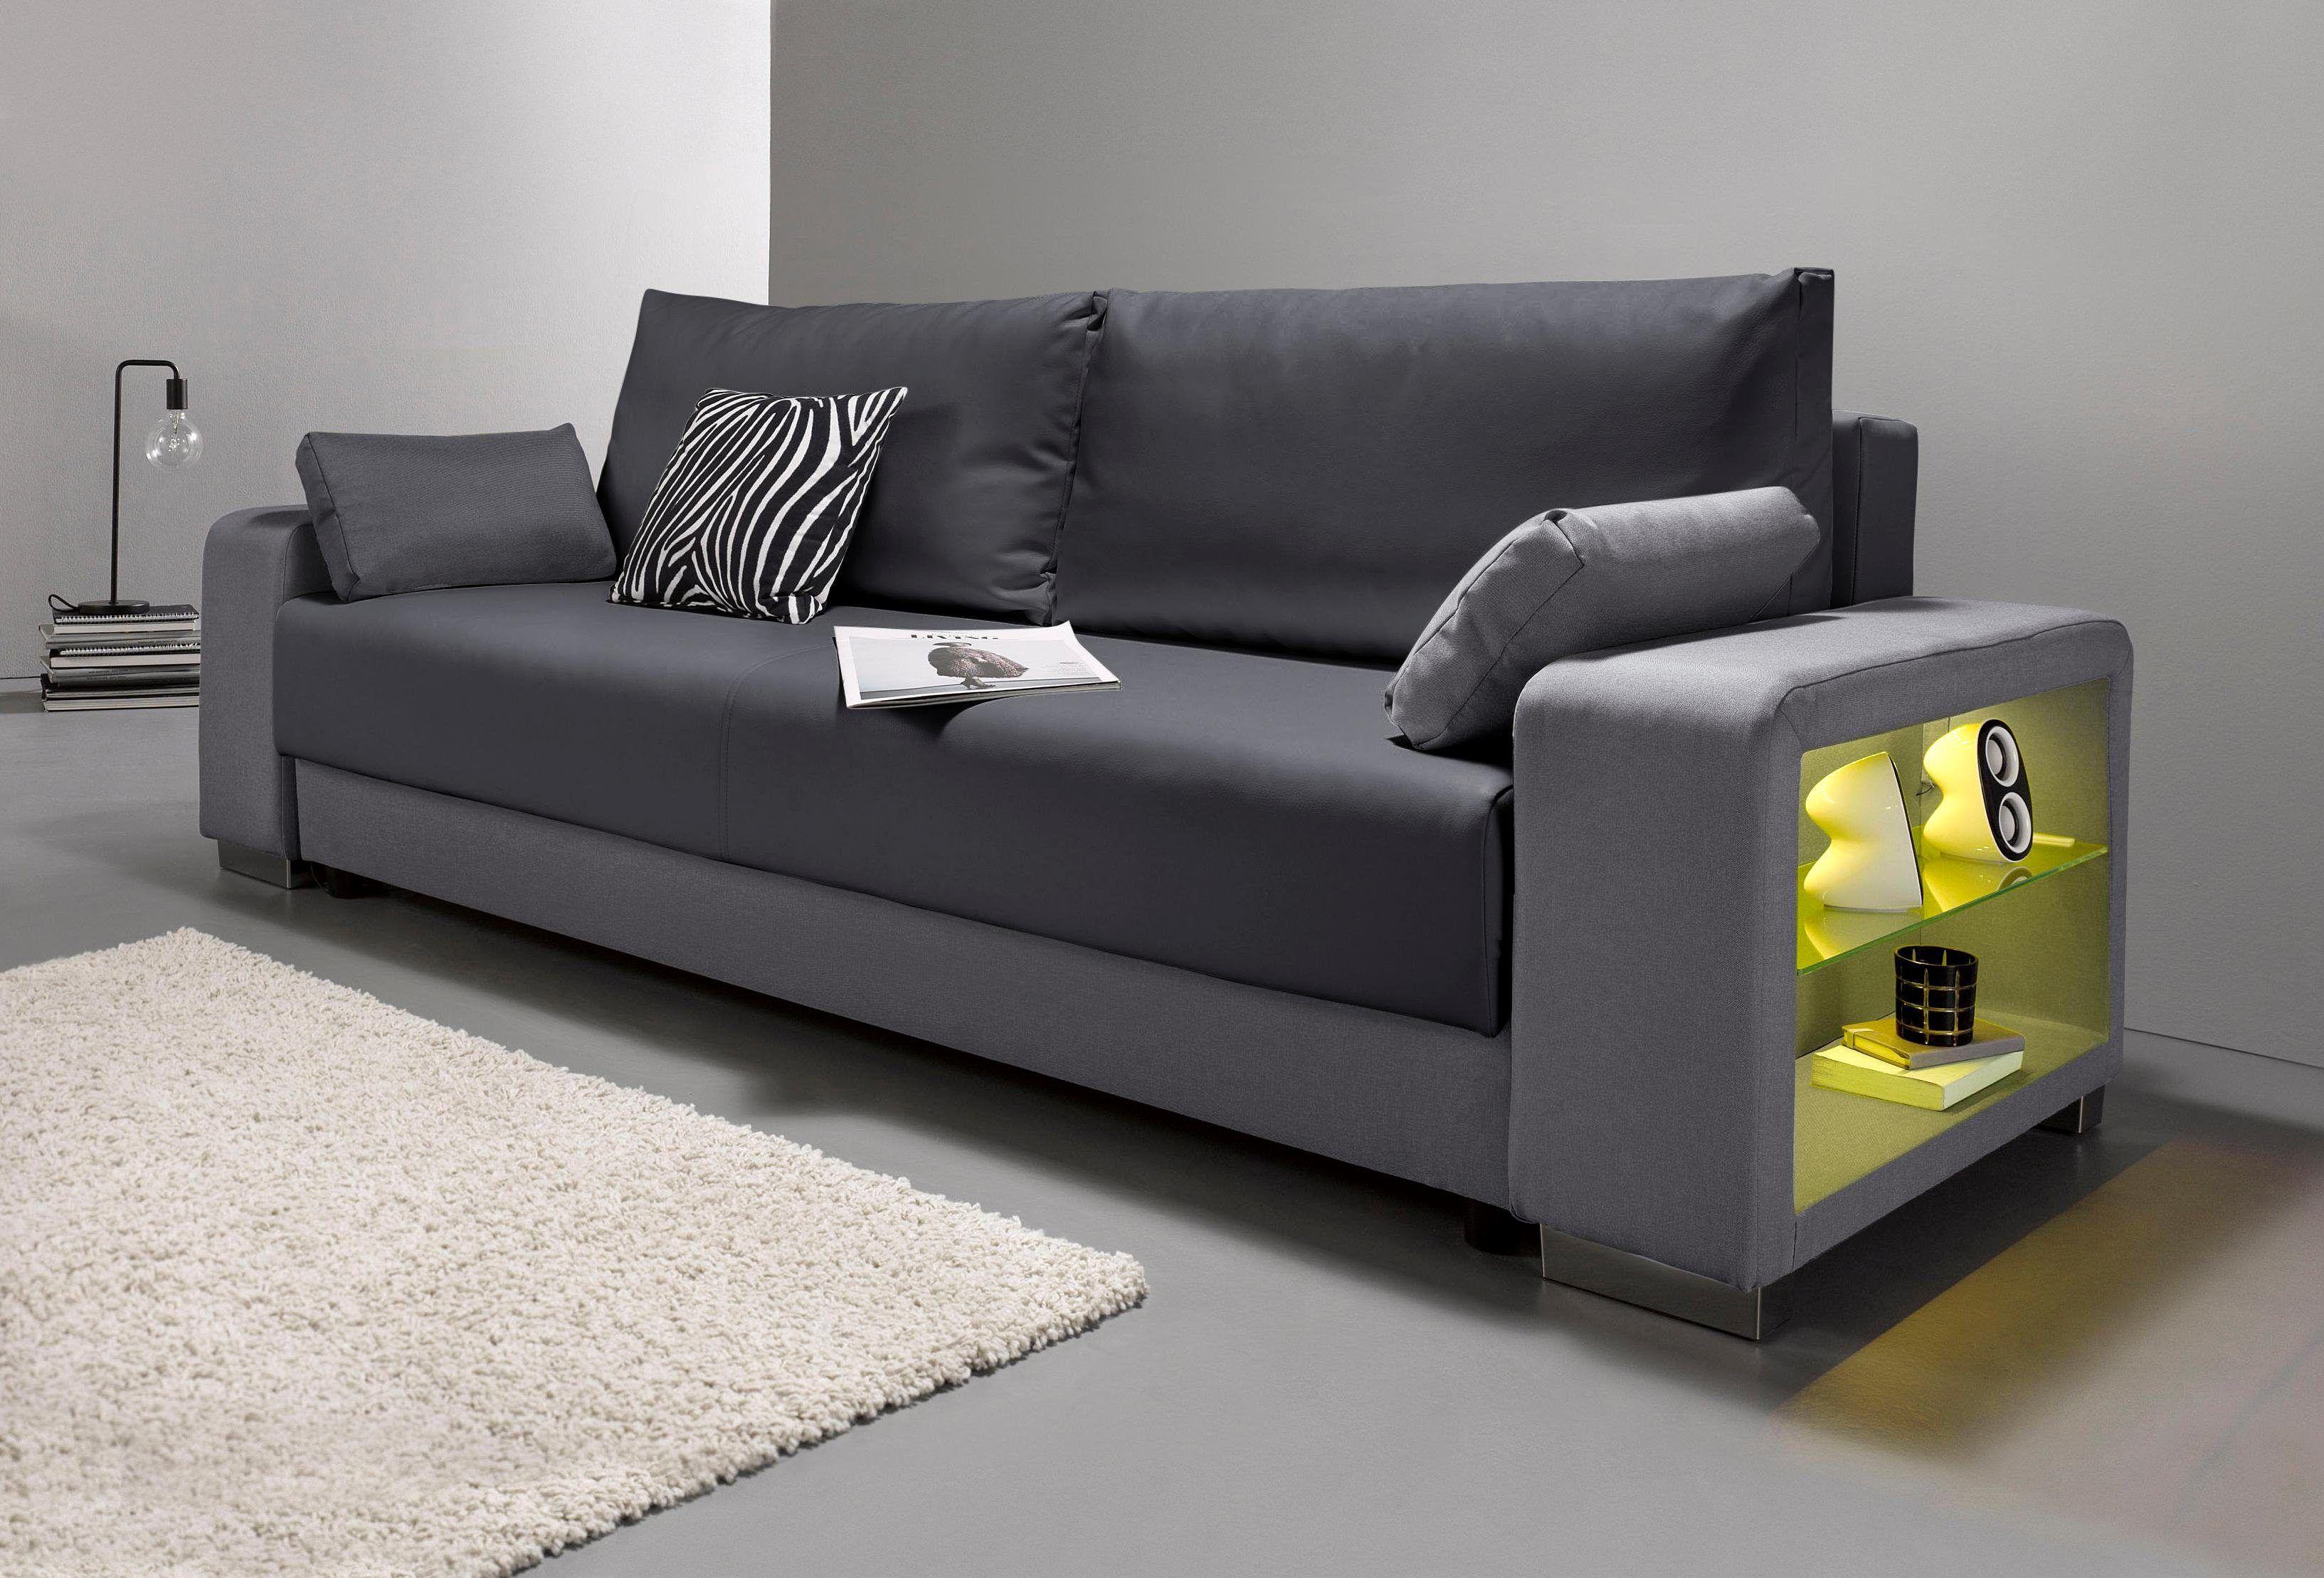 Ecksofa Grau Struktur Design Sectional Sofa Online Billige Couch Online Kaufen Big Sofa Kolonialstil Leder Schlafsofa Gu Grosse Sofas Moderne Couch Sofa